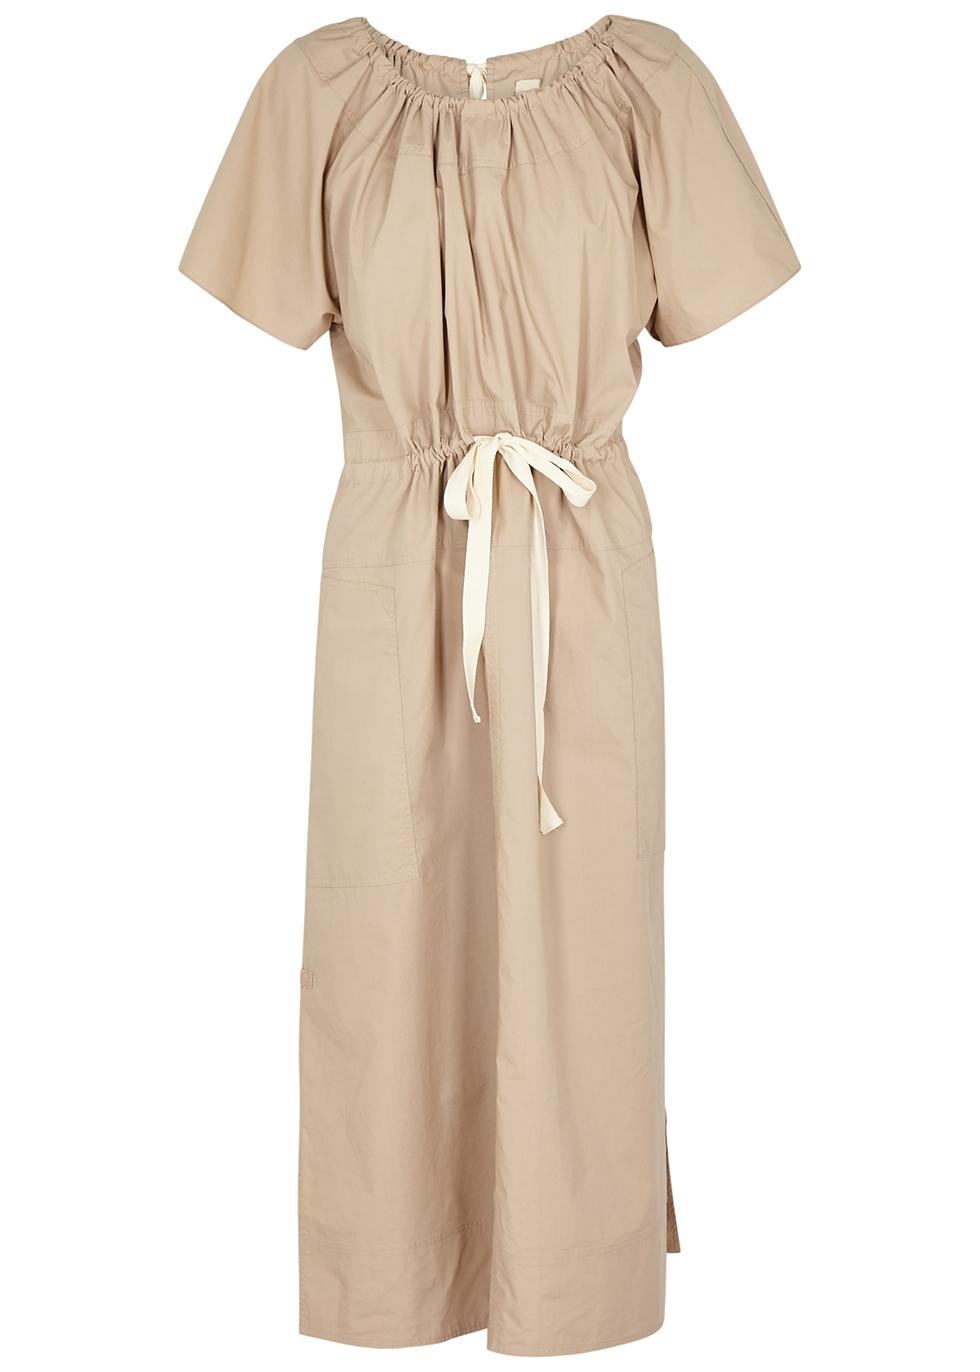 Workroom sand poplin midi dress